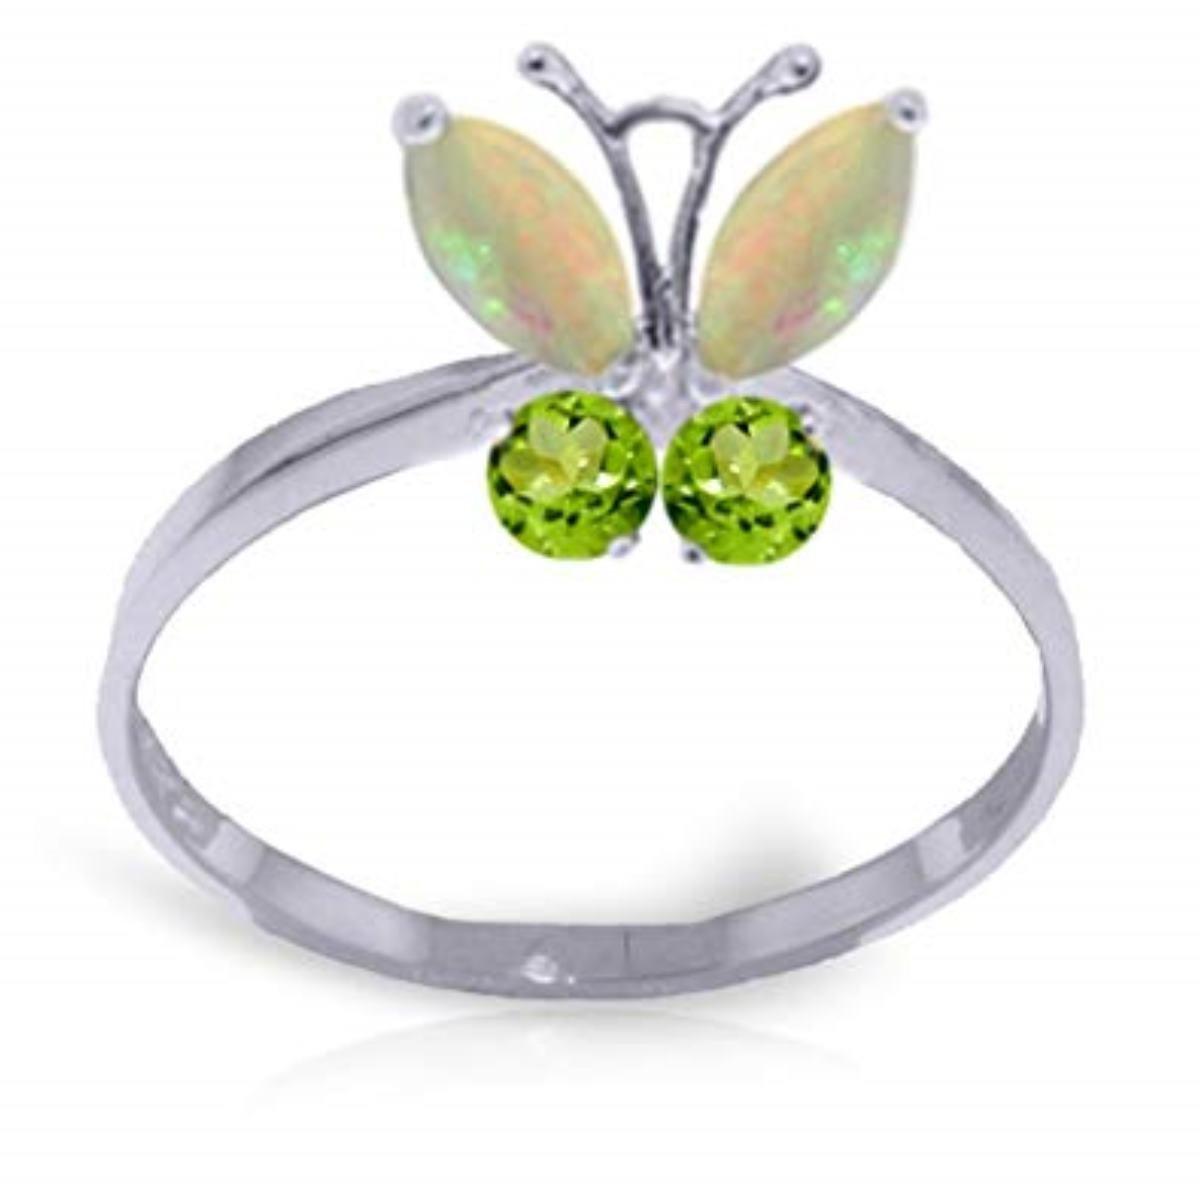 Opal Peridot Flying Butterfly Gemstone Ring Solid 14K White Gold 2348-W